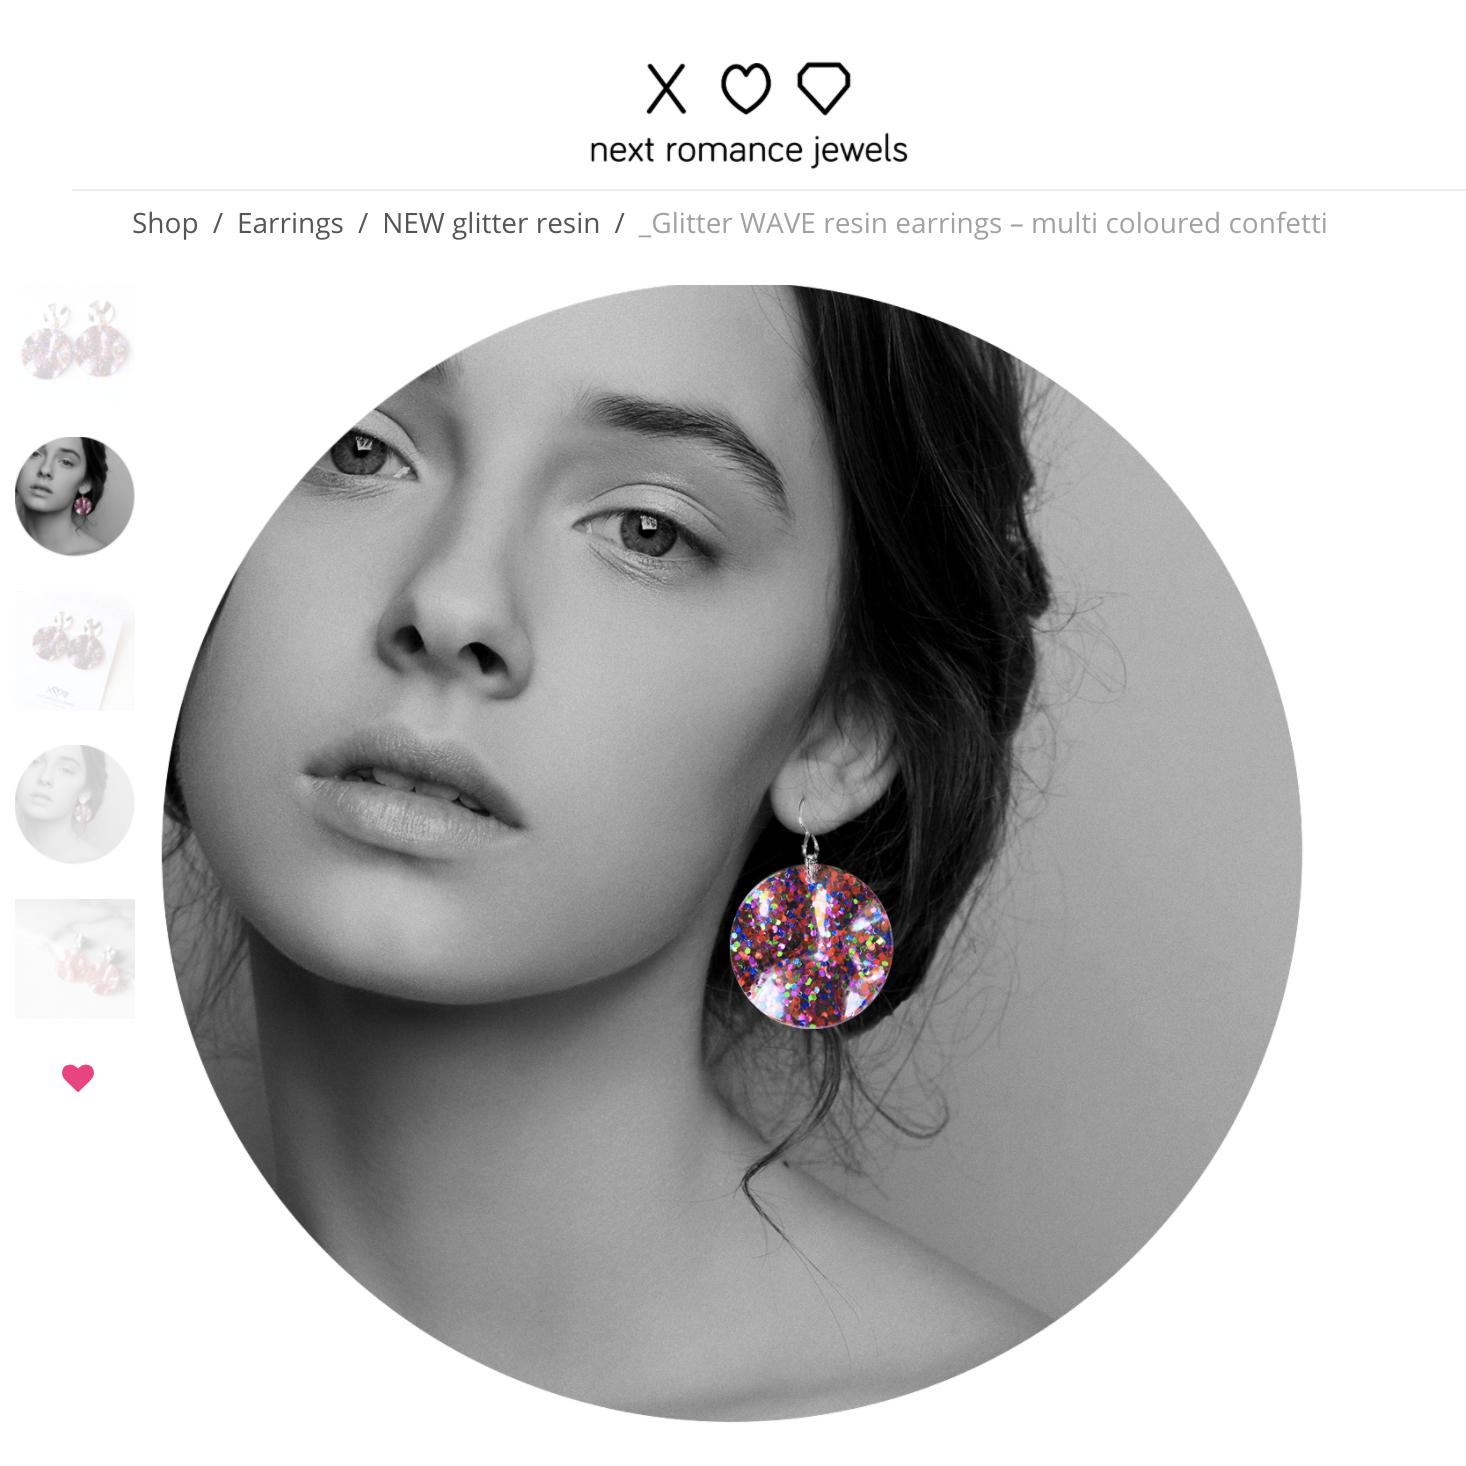 unique handmade resin glitter earrings by next romance jewellery australia